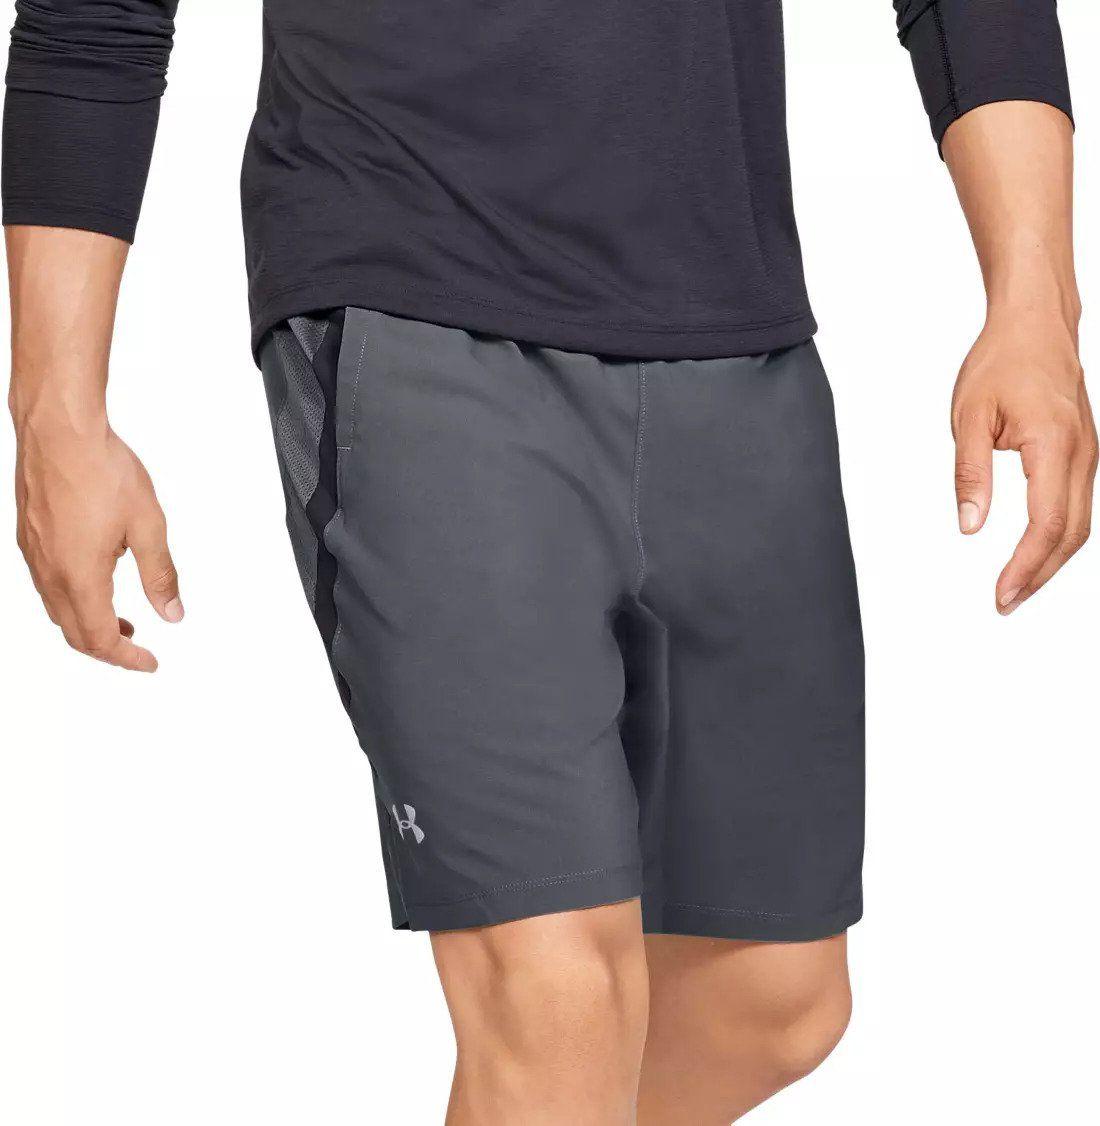 Under Armour Men's Launch 9'' Running Shorts